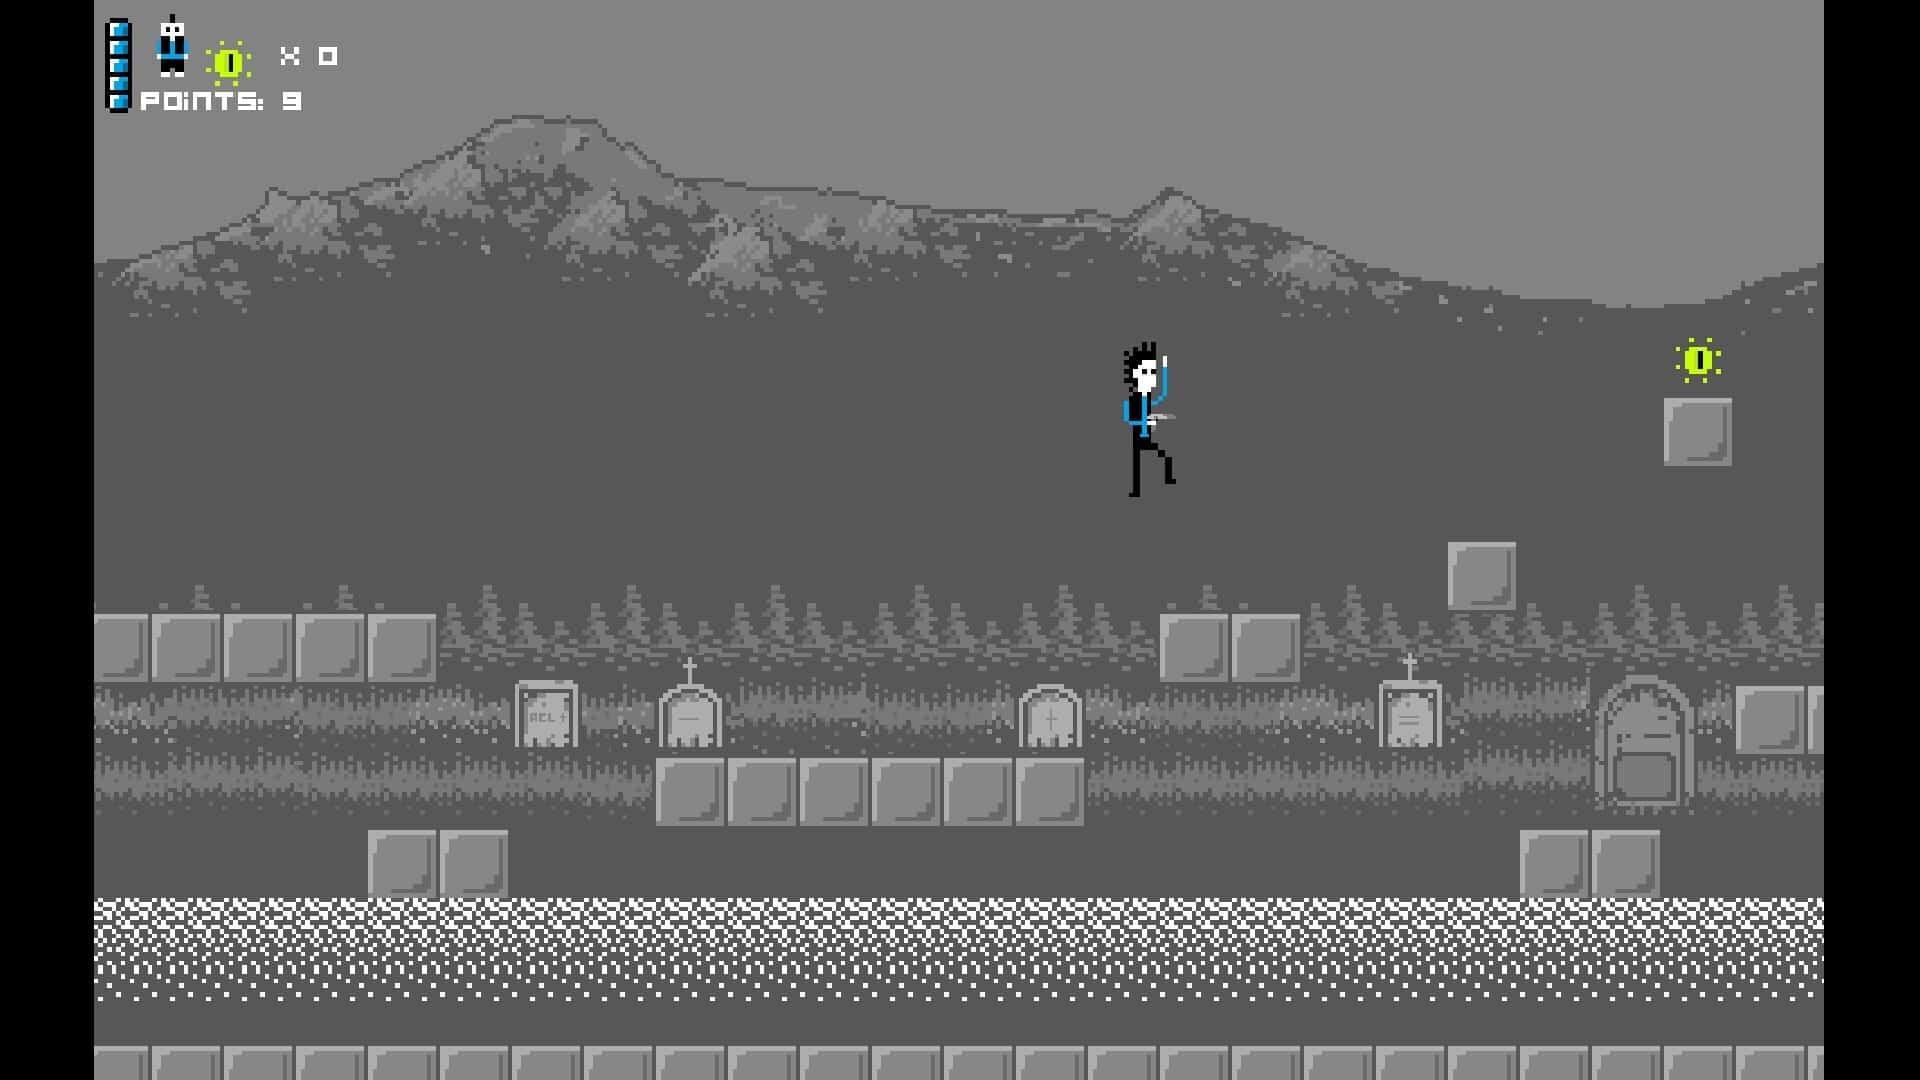 Abo Mando game screenshot platforms